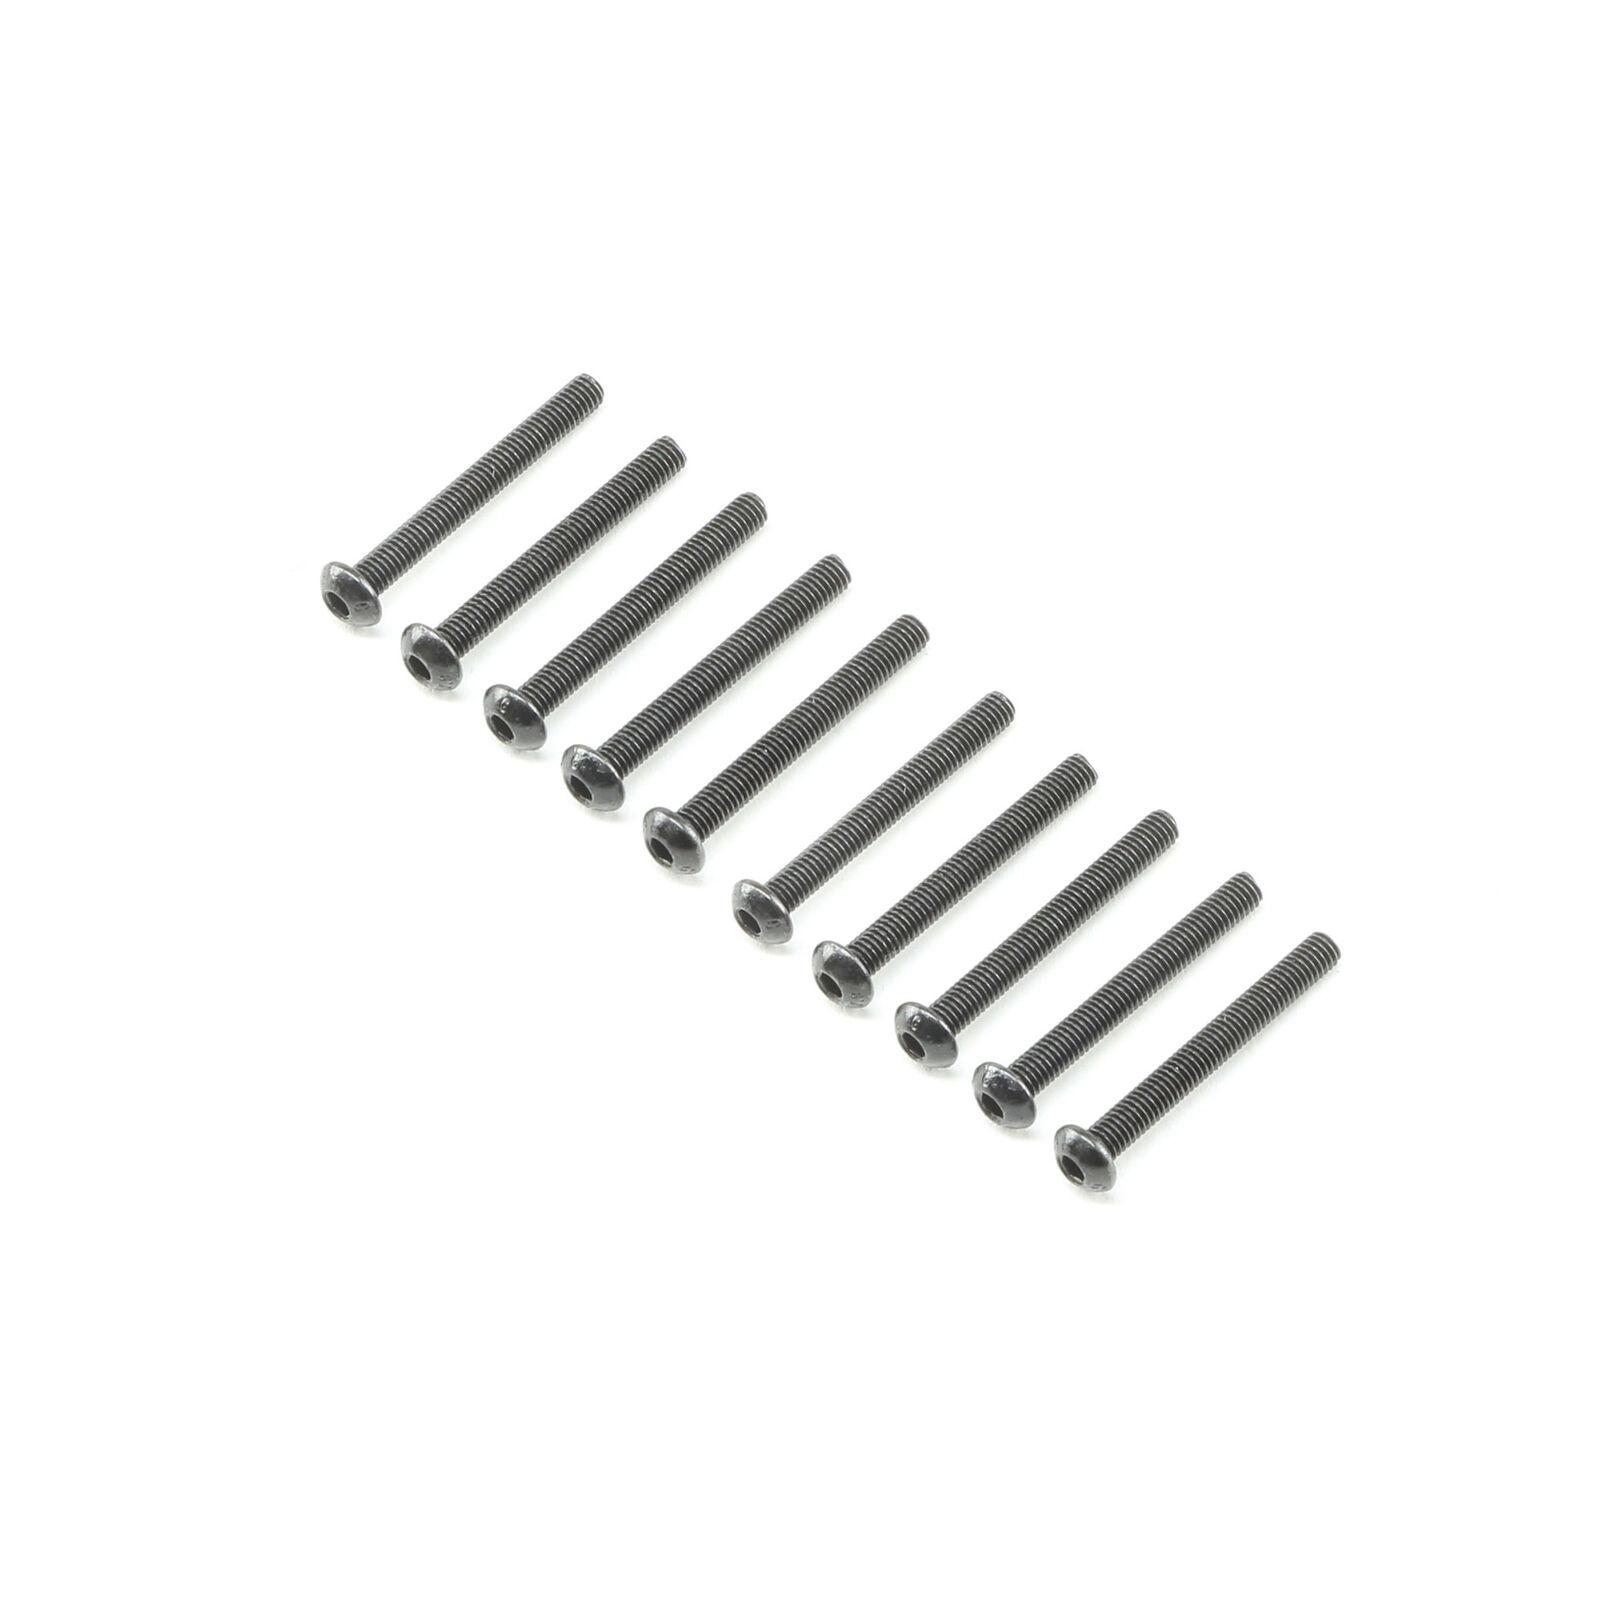 Button Head Screws M3x25mm (10)